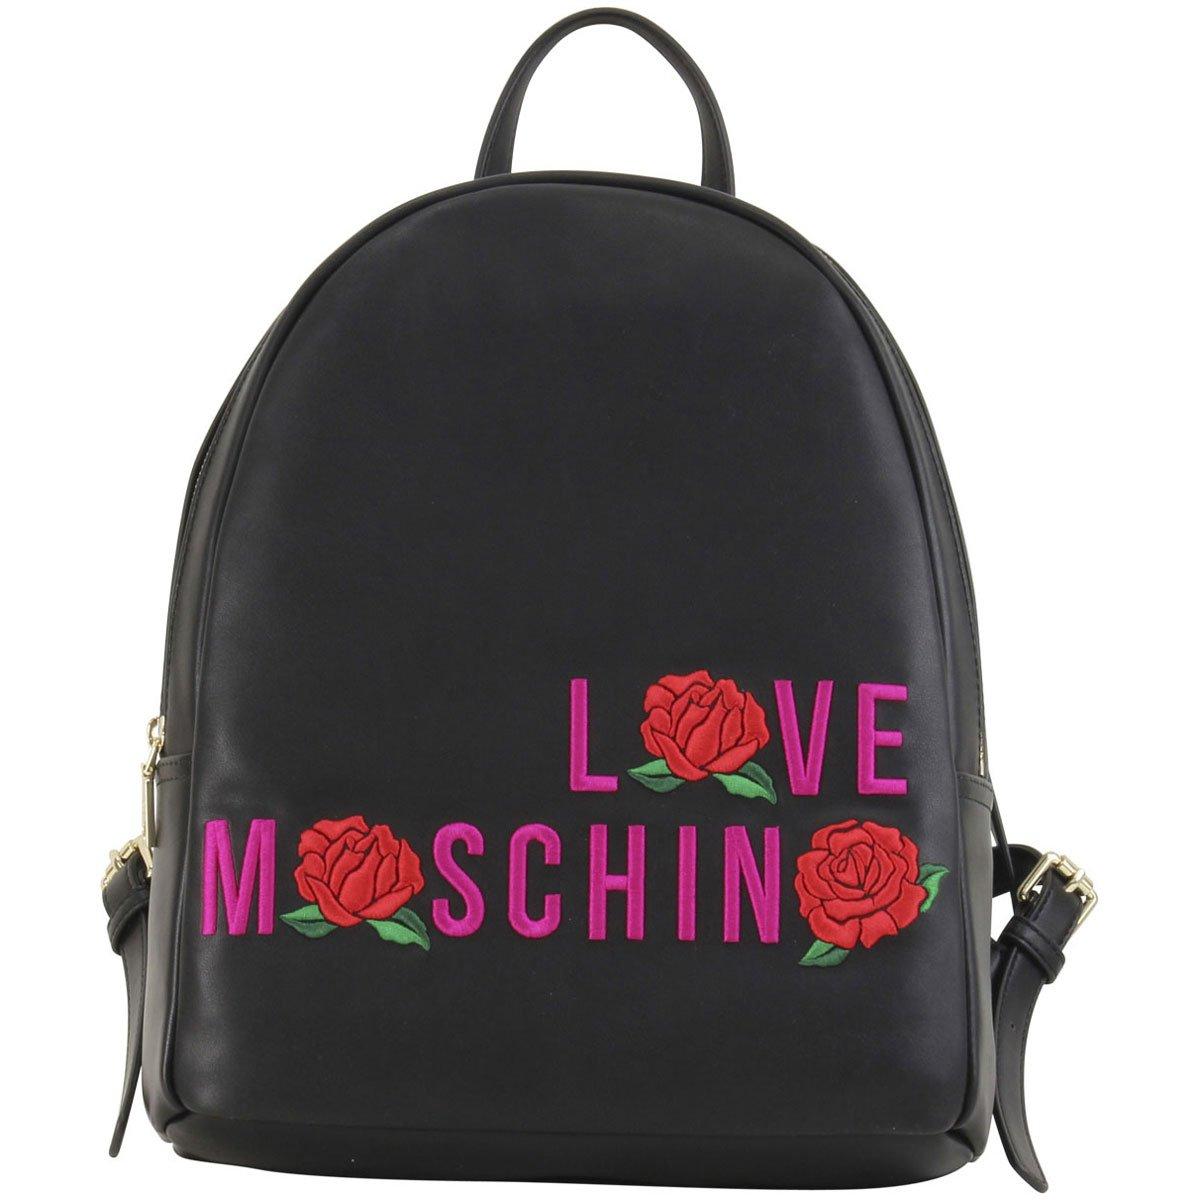 LOVE Moschino Women's Logo Rose Backpack Black Backpack